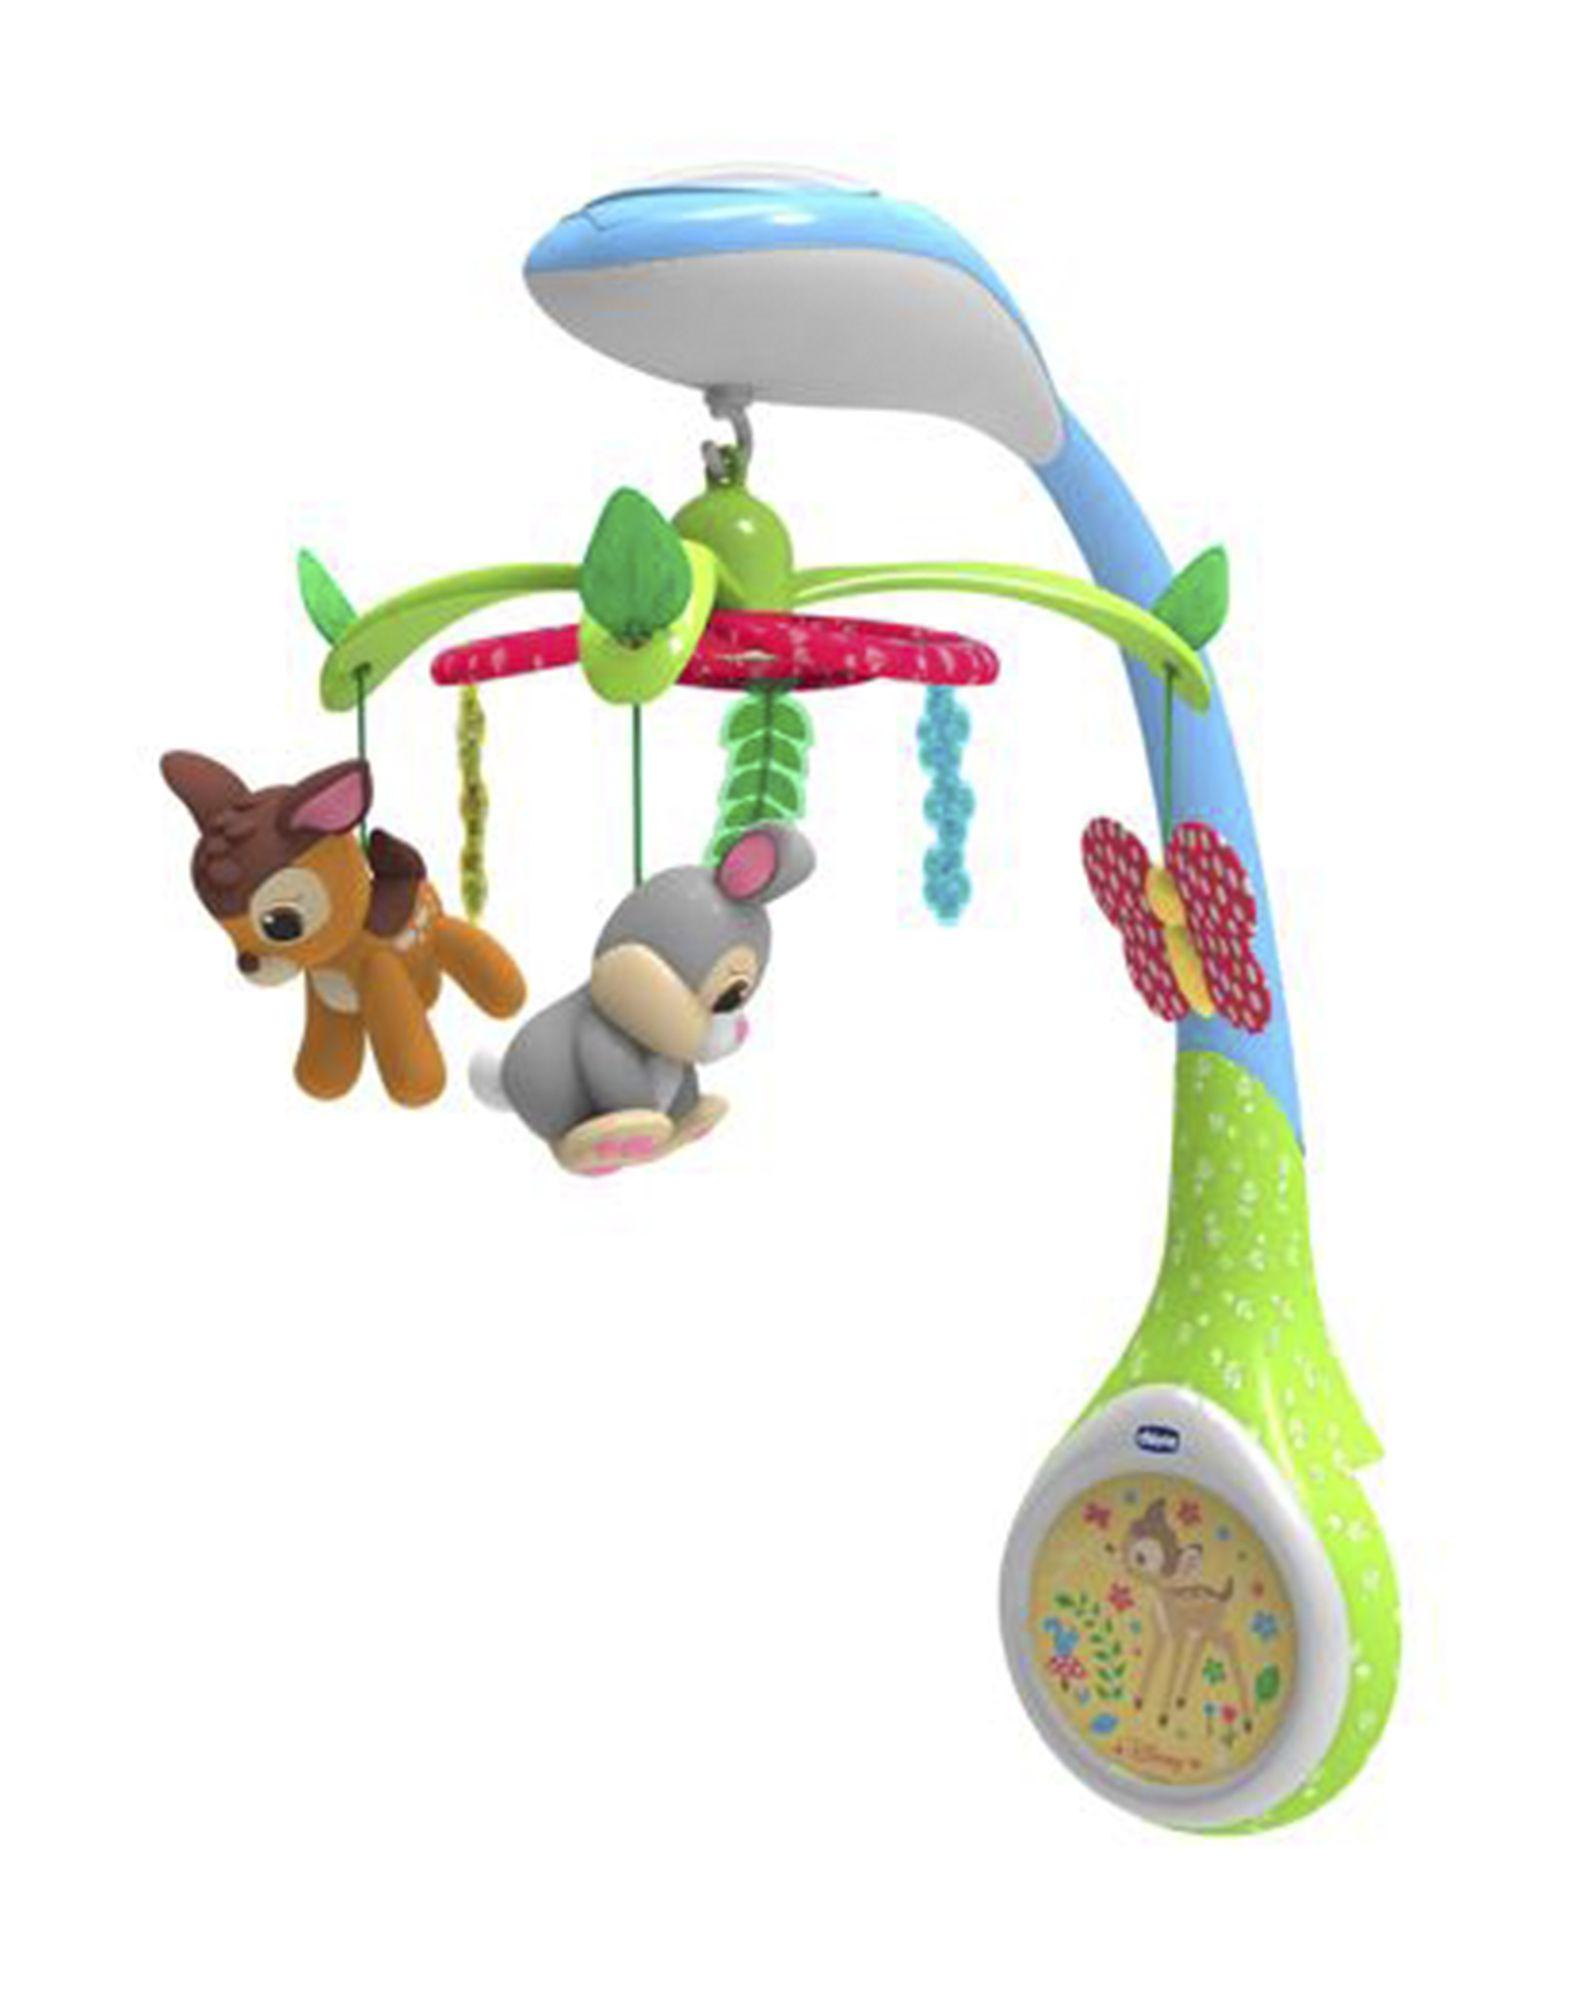 CHICCO Музыкальные игрушки музыкальные игрушки азбукварик новогодние игрушки елочка